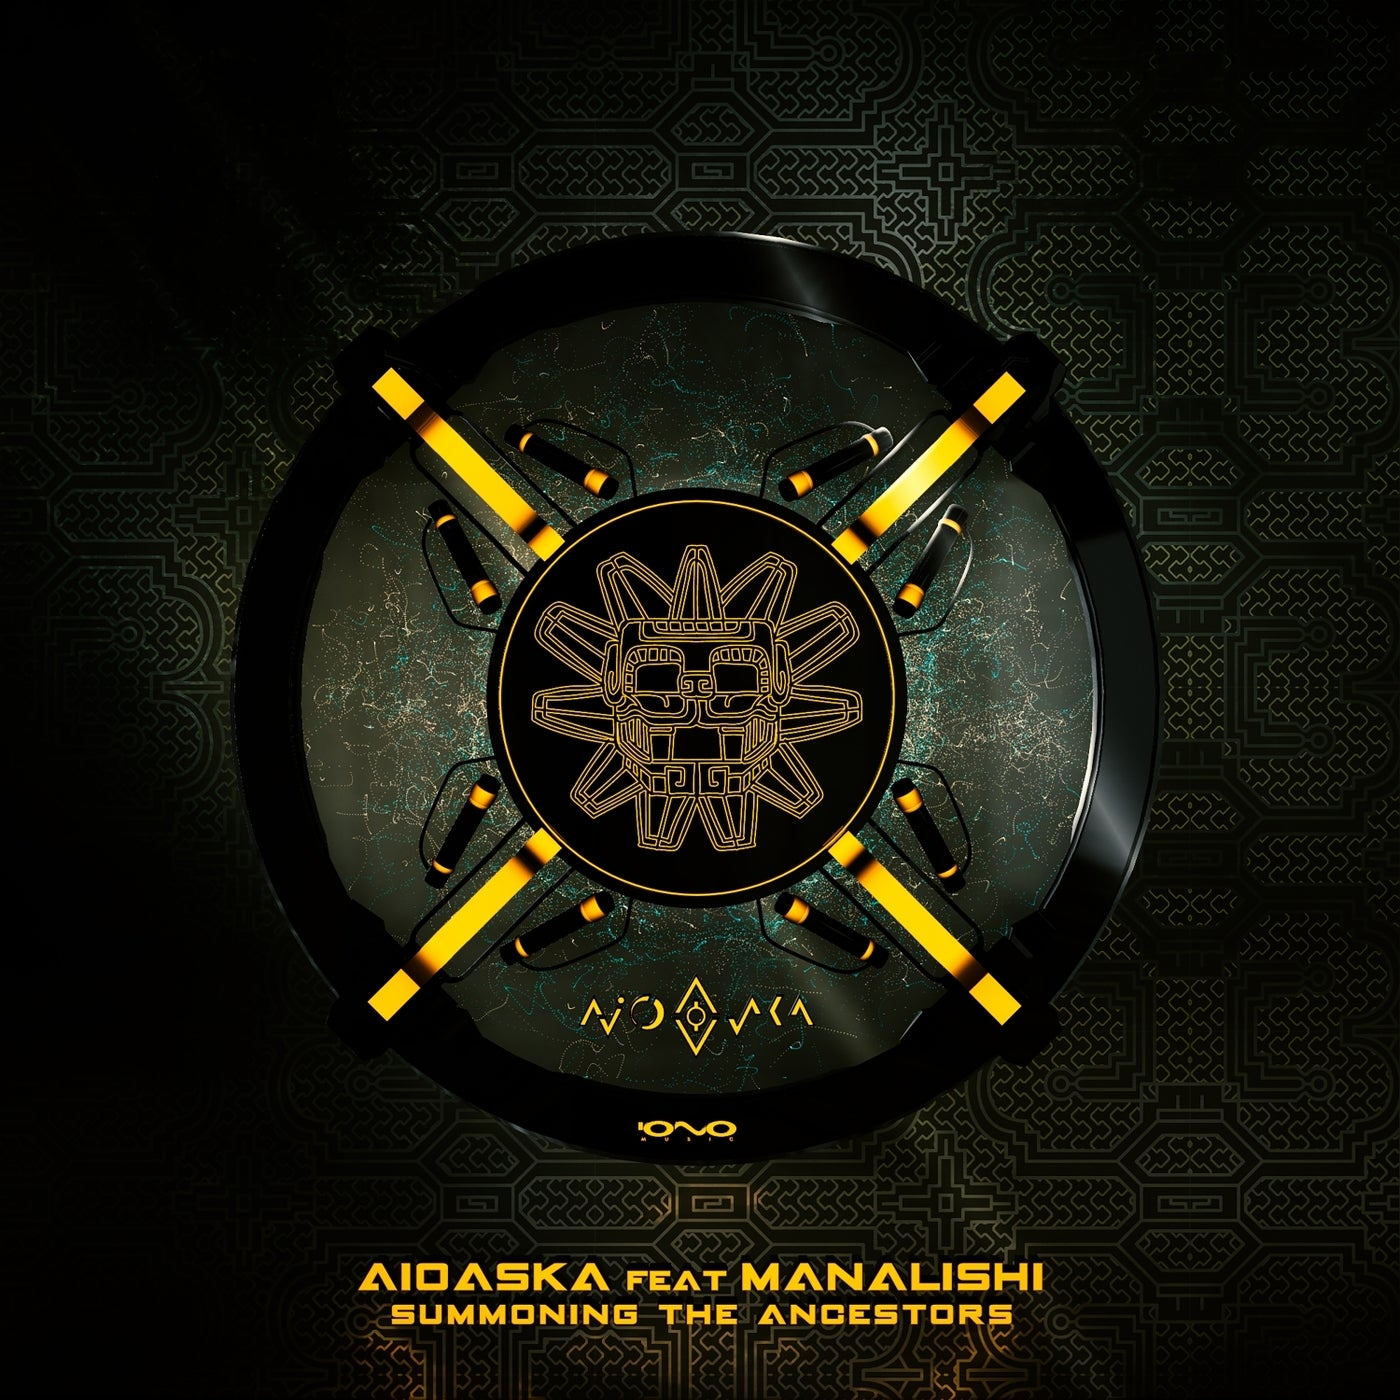 Summoning the Ancestors Feat. Manalishi (Original Mix)